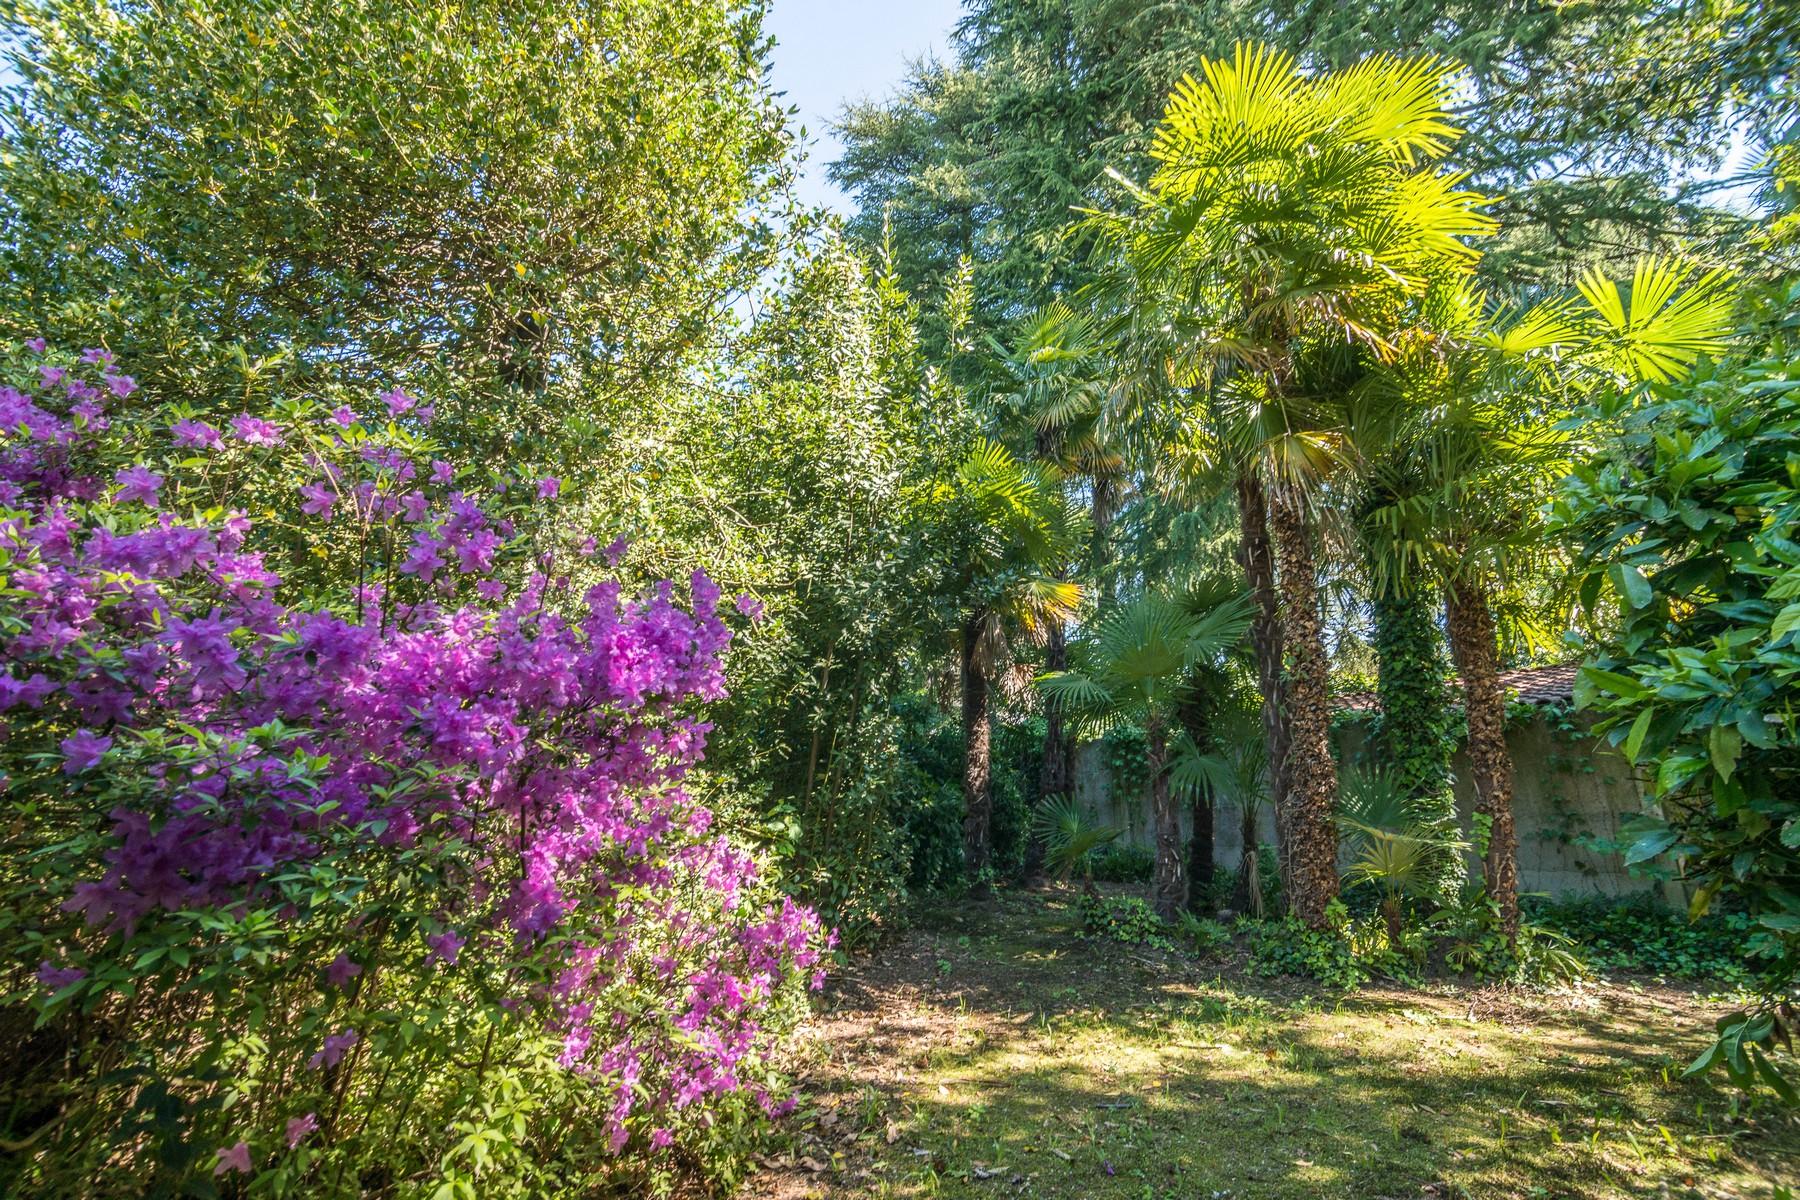 Villa in Vendita a Varese: 5 locali, 1500 mq - Foto 10